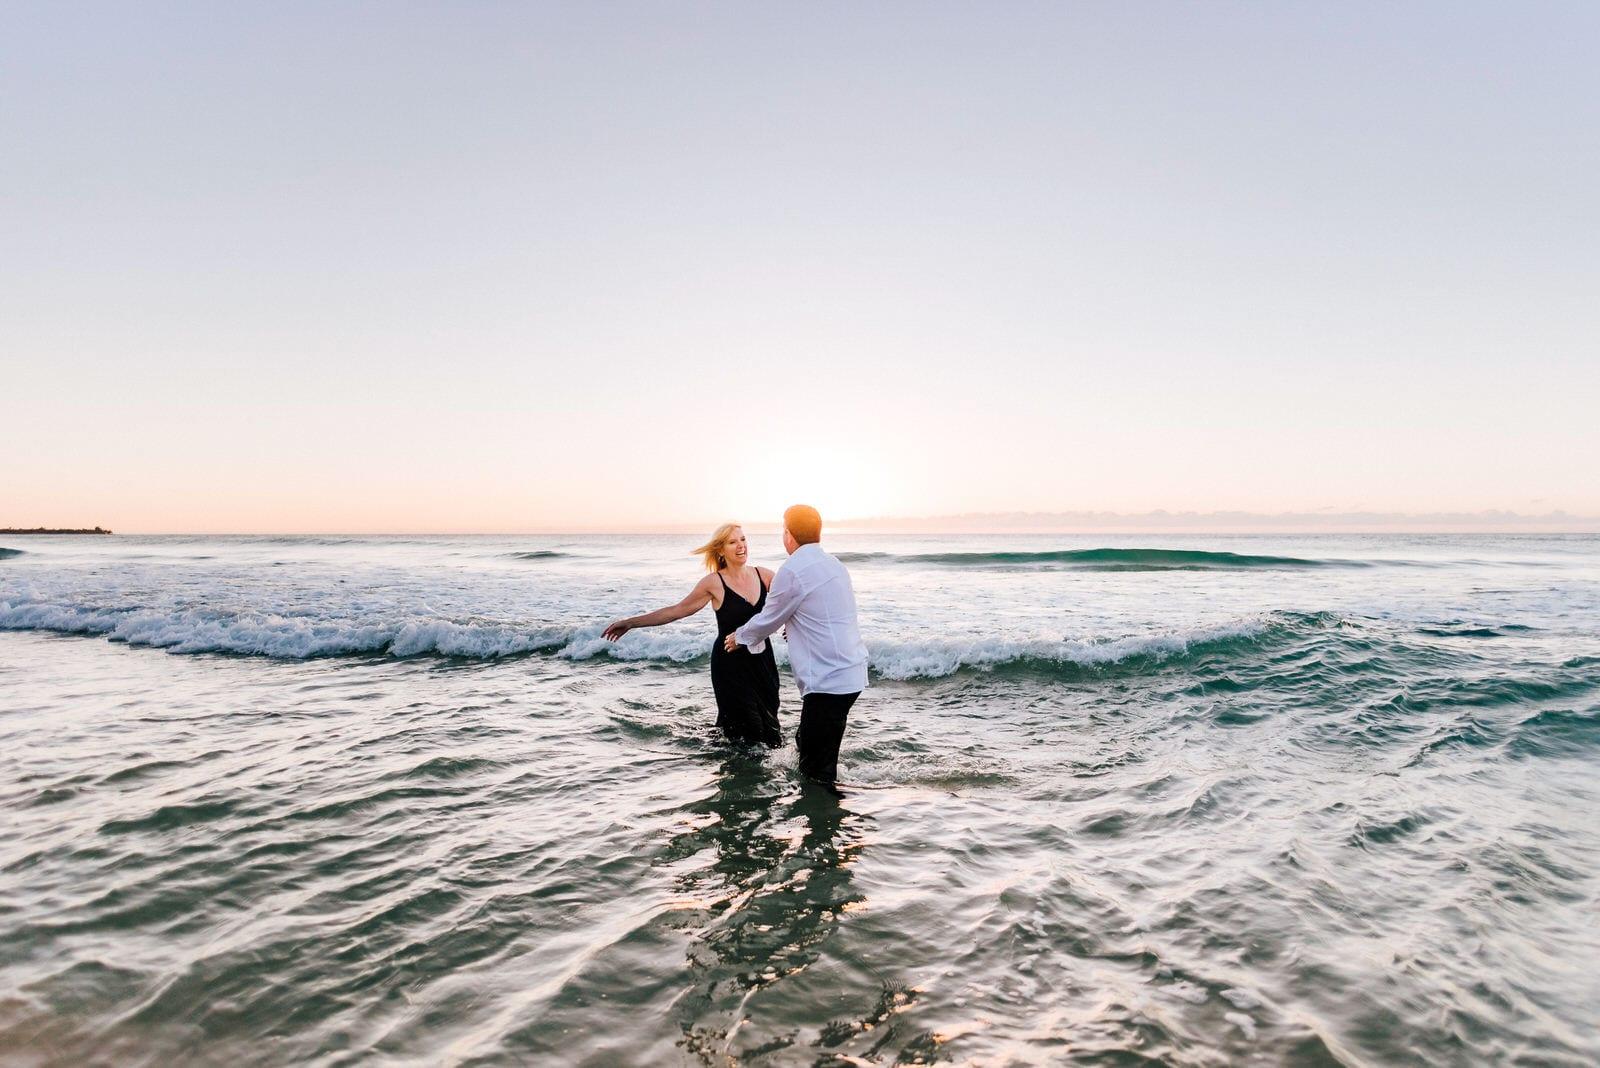 kona-engagement-photographer-navy-dress-sunset-21.jpg